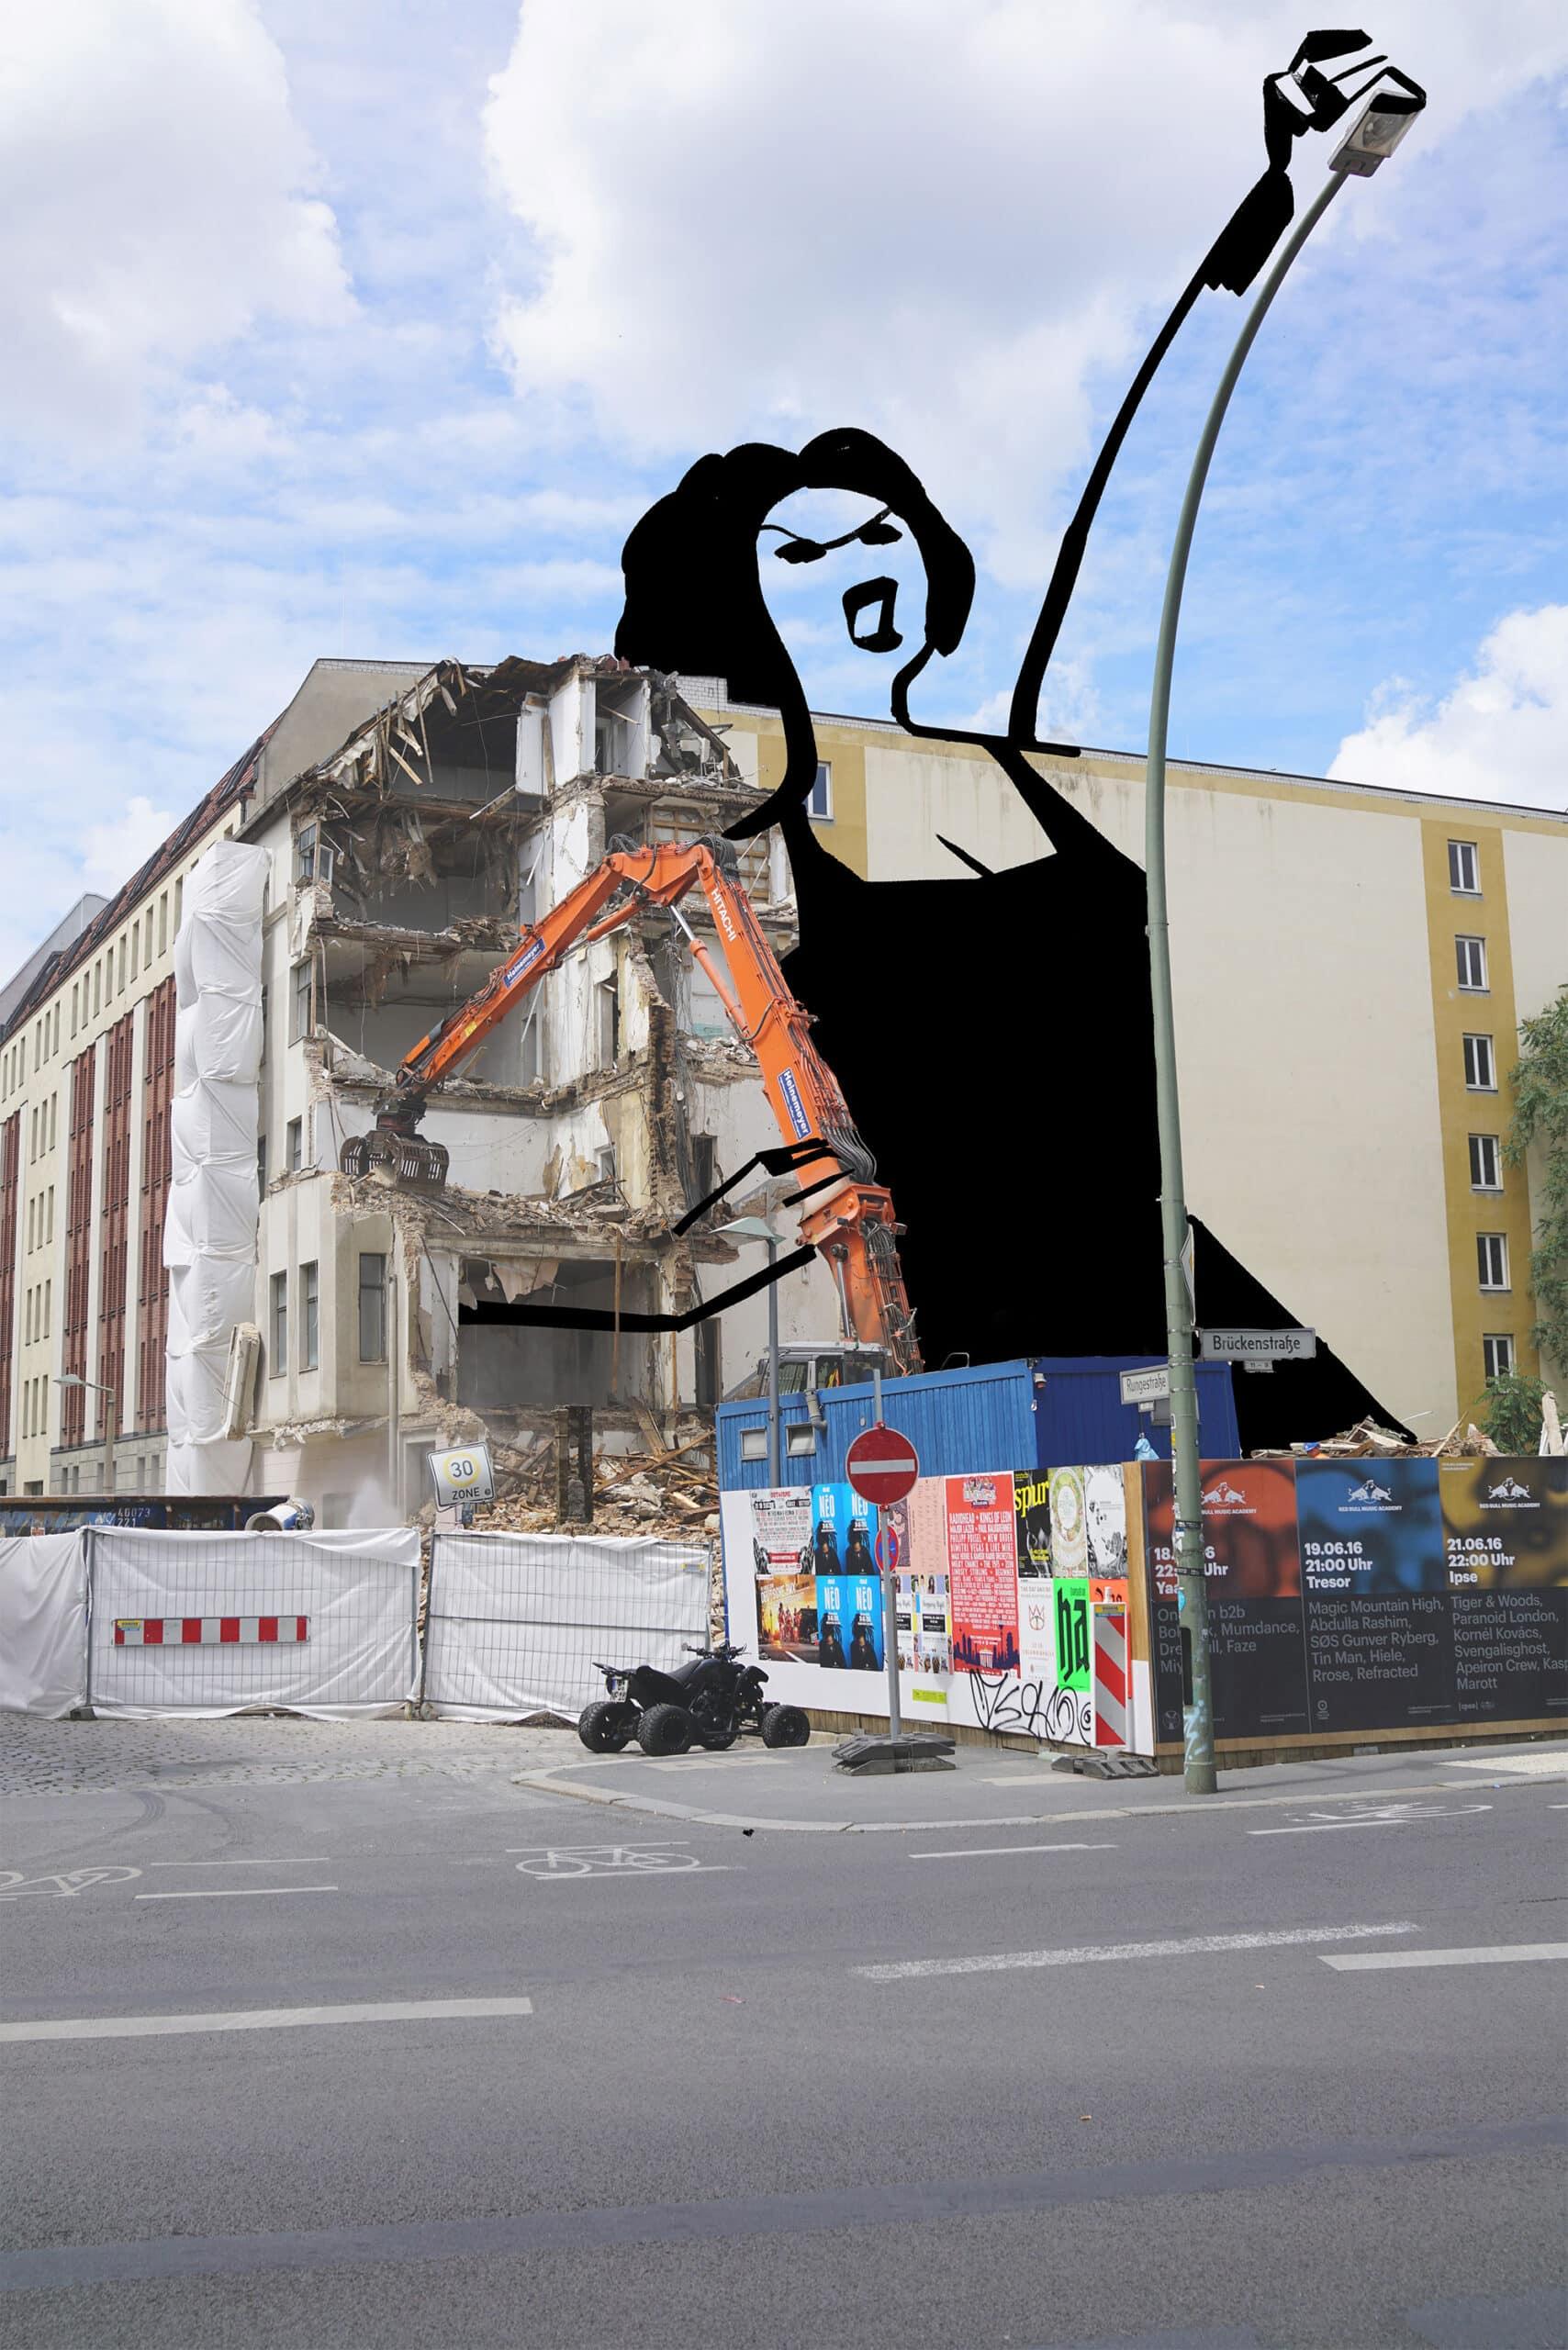 mujer construccion sunday sketches chritoph niemann